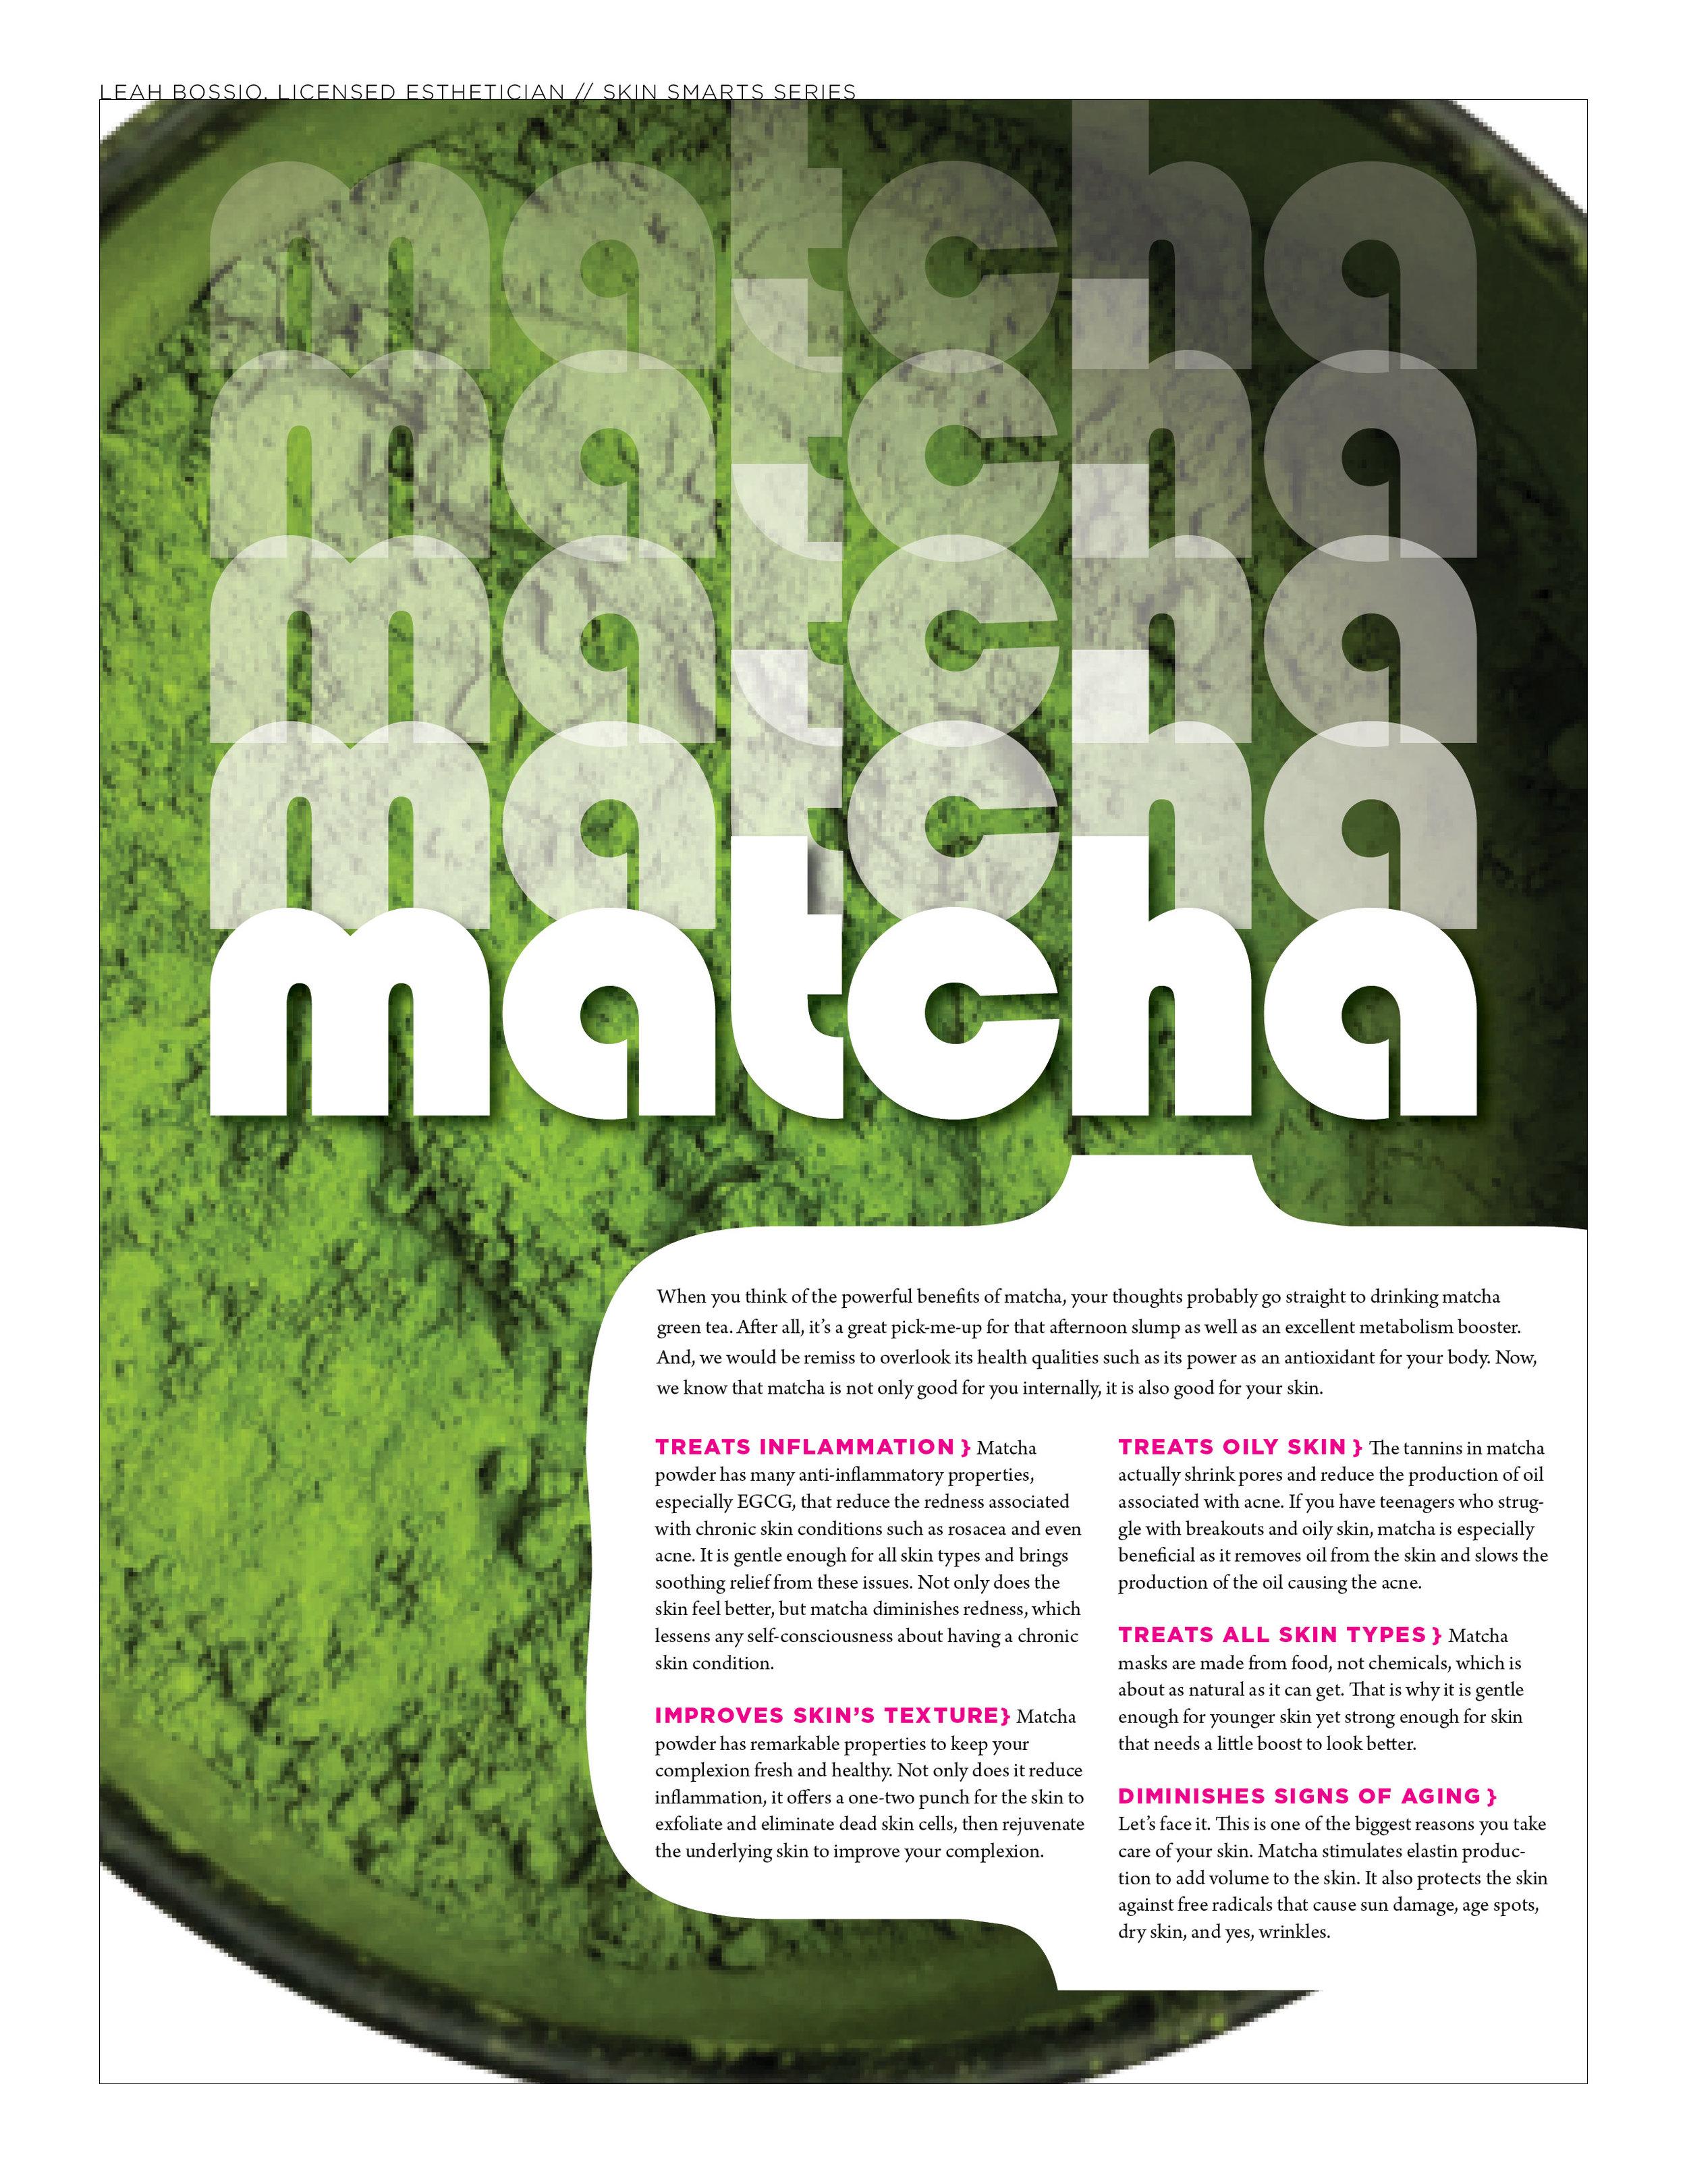 skinsmarts.matcha.2.jpg